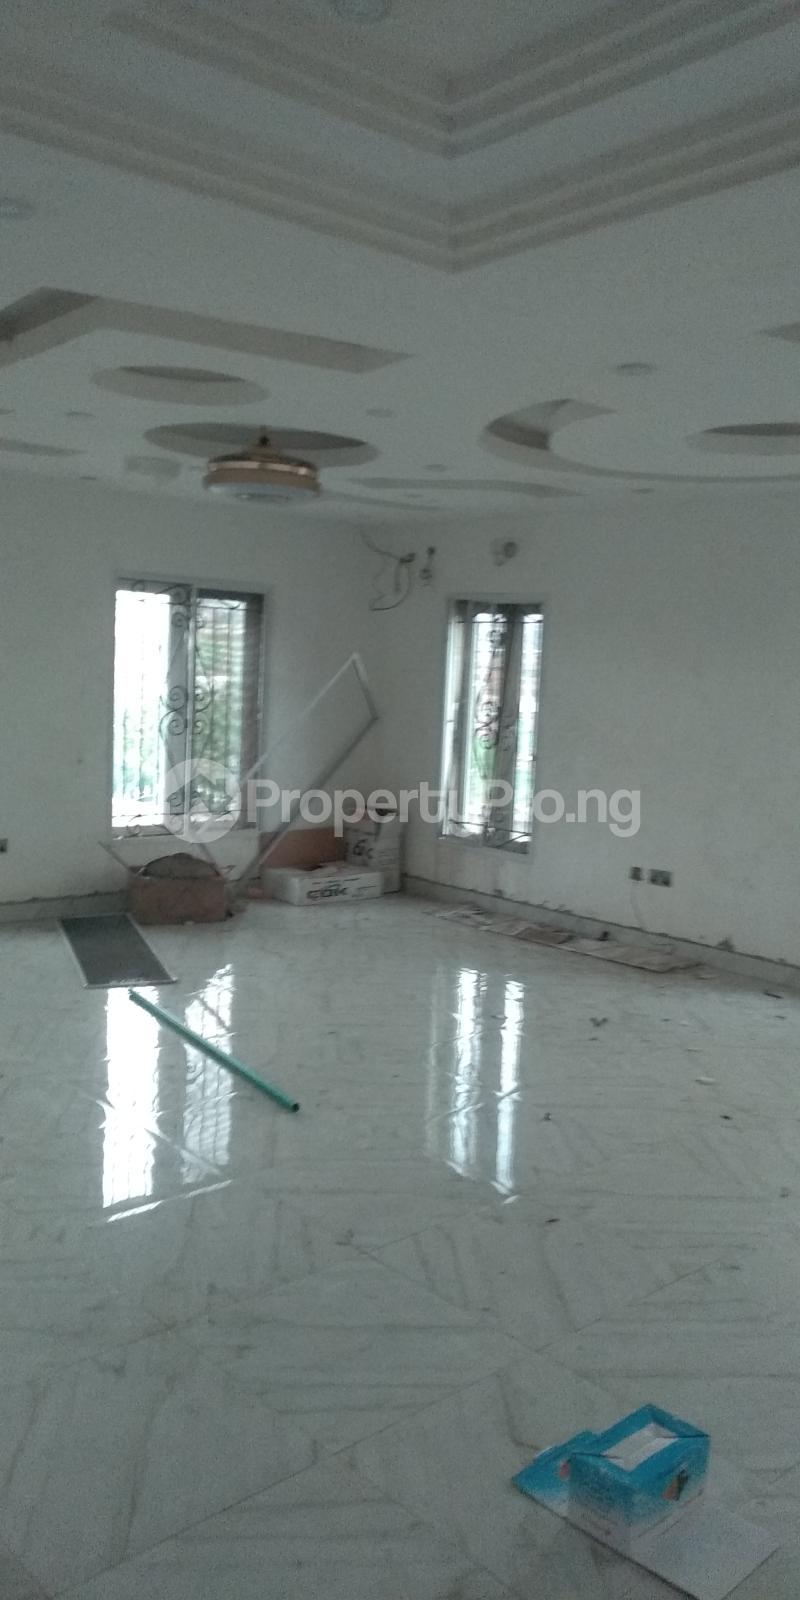 5 bedroom Land for sale Bashiru shittu street magodo shangisha Magodo GRA Phase 2 Kosofe/Ikosi Lagos - 4